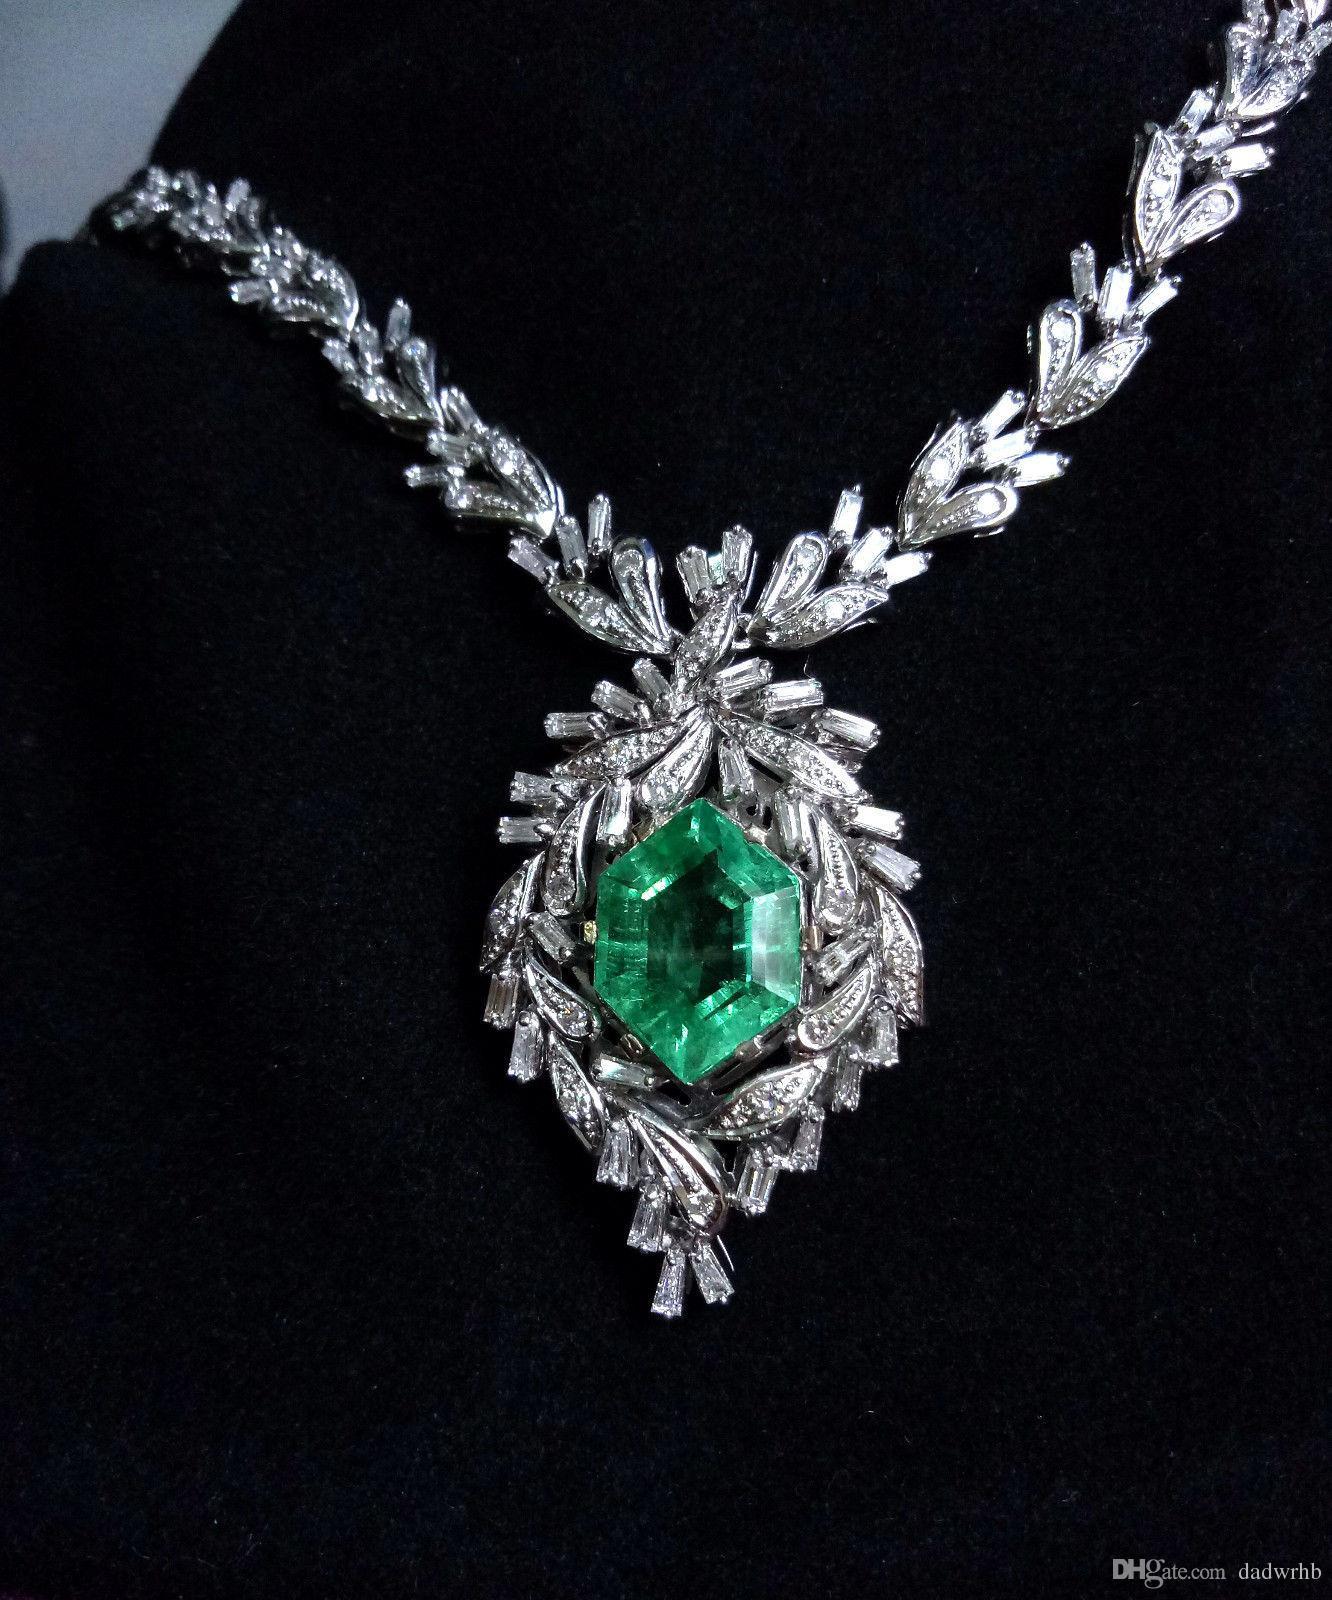 Compre antiguo natural ruso emerald diamond collar 112ct certified compre antiguo natural ruso emerald diamond collar 112ct certified a 5528 del dadwrhb dhgate aloadofball Images